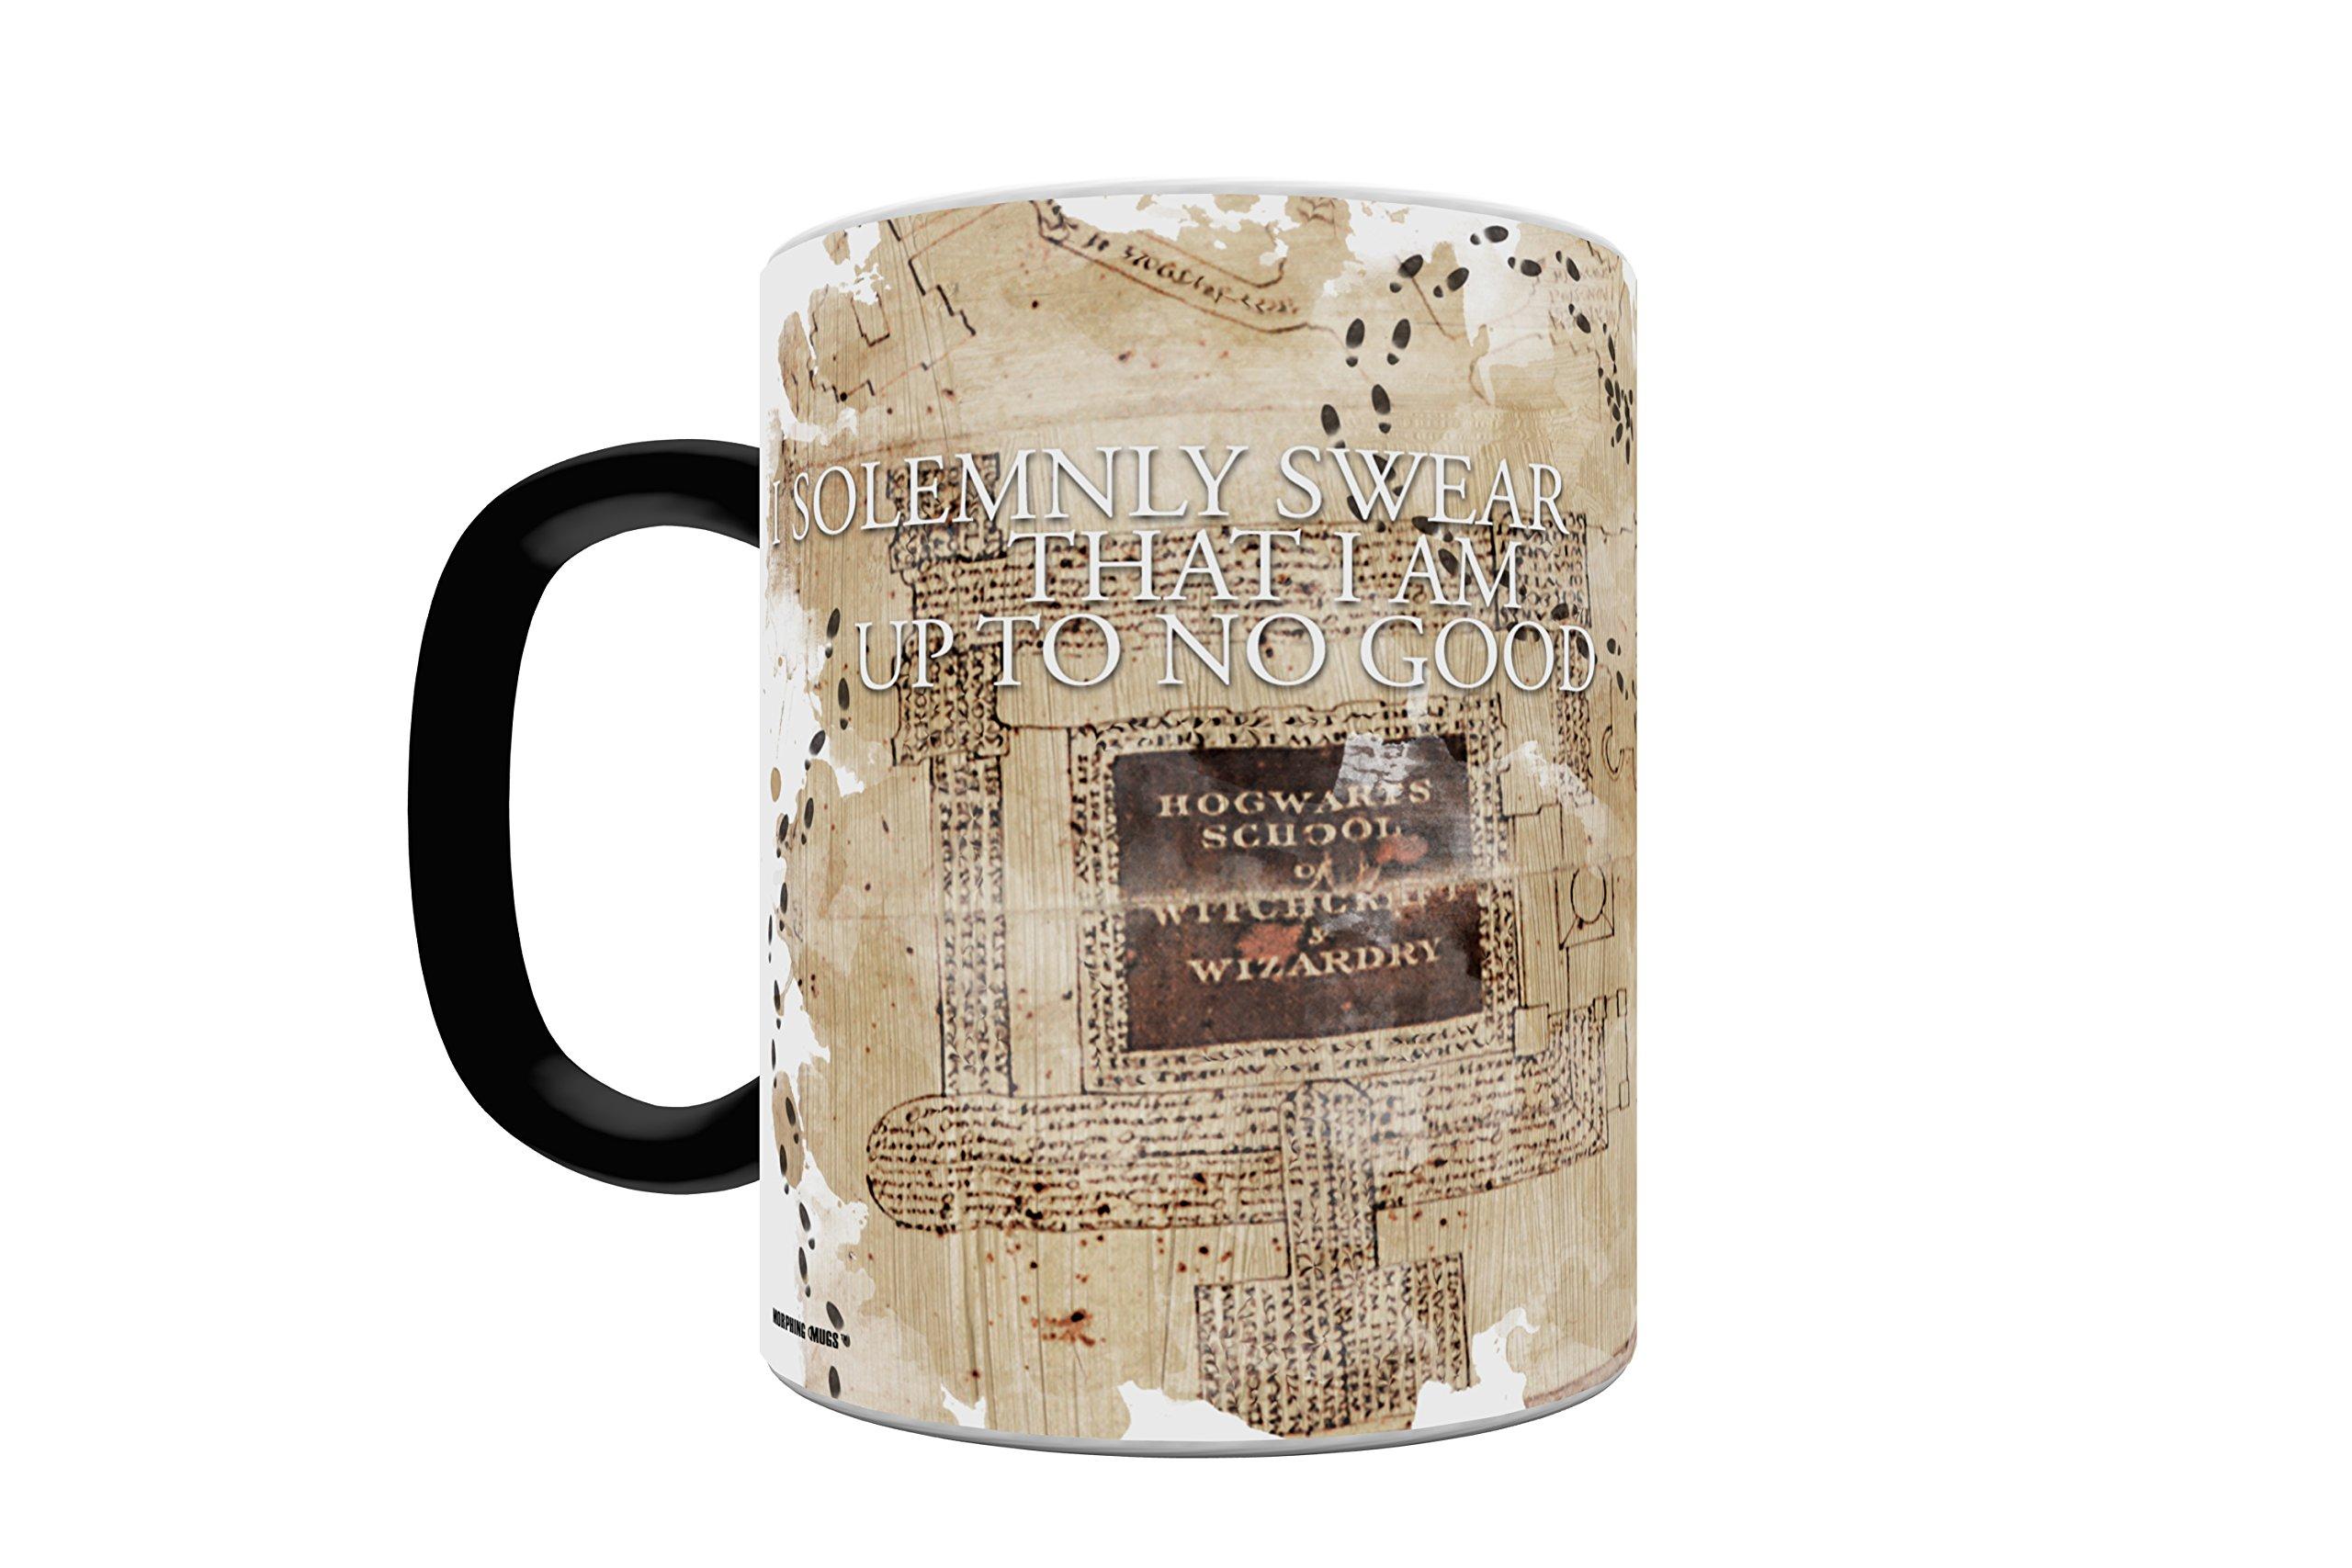 Morphing Mugs Harry Potter Hogwarts Marauders Map Heat Reveal Ceramic Coffee Mug - 11 Ounces by Morphing Mugs (Image #3)